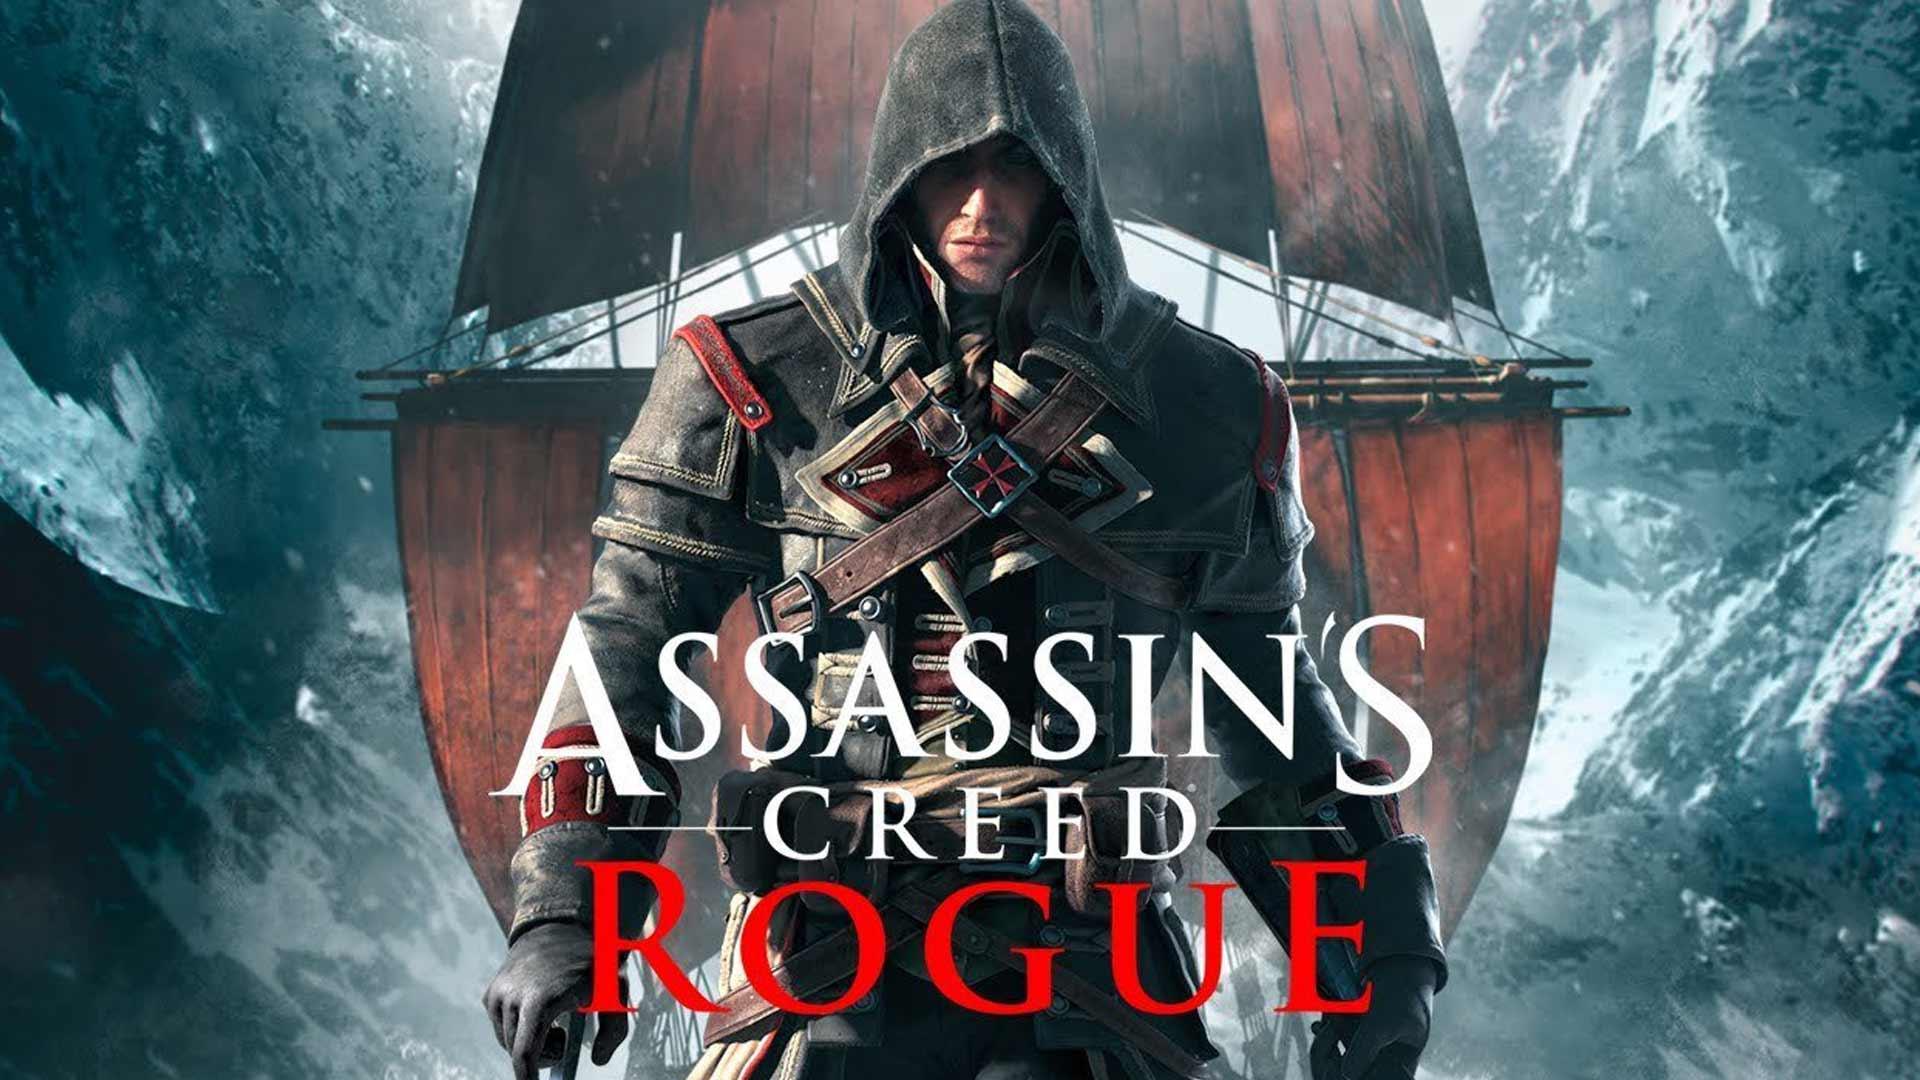 Assassin's Creed - Судьба